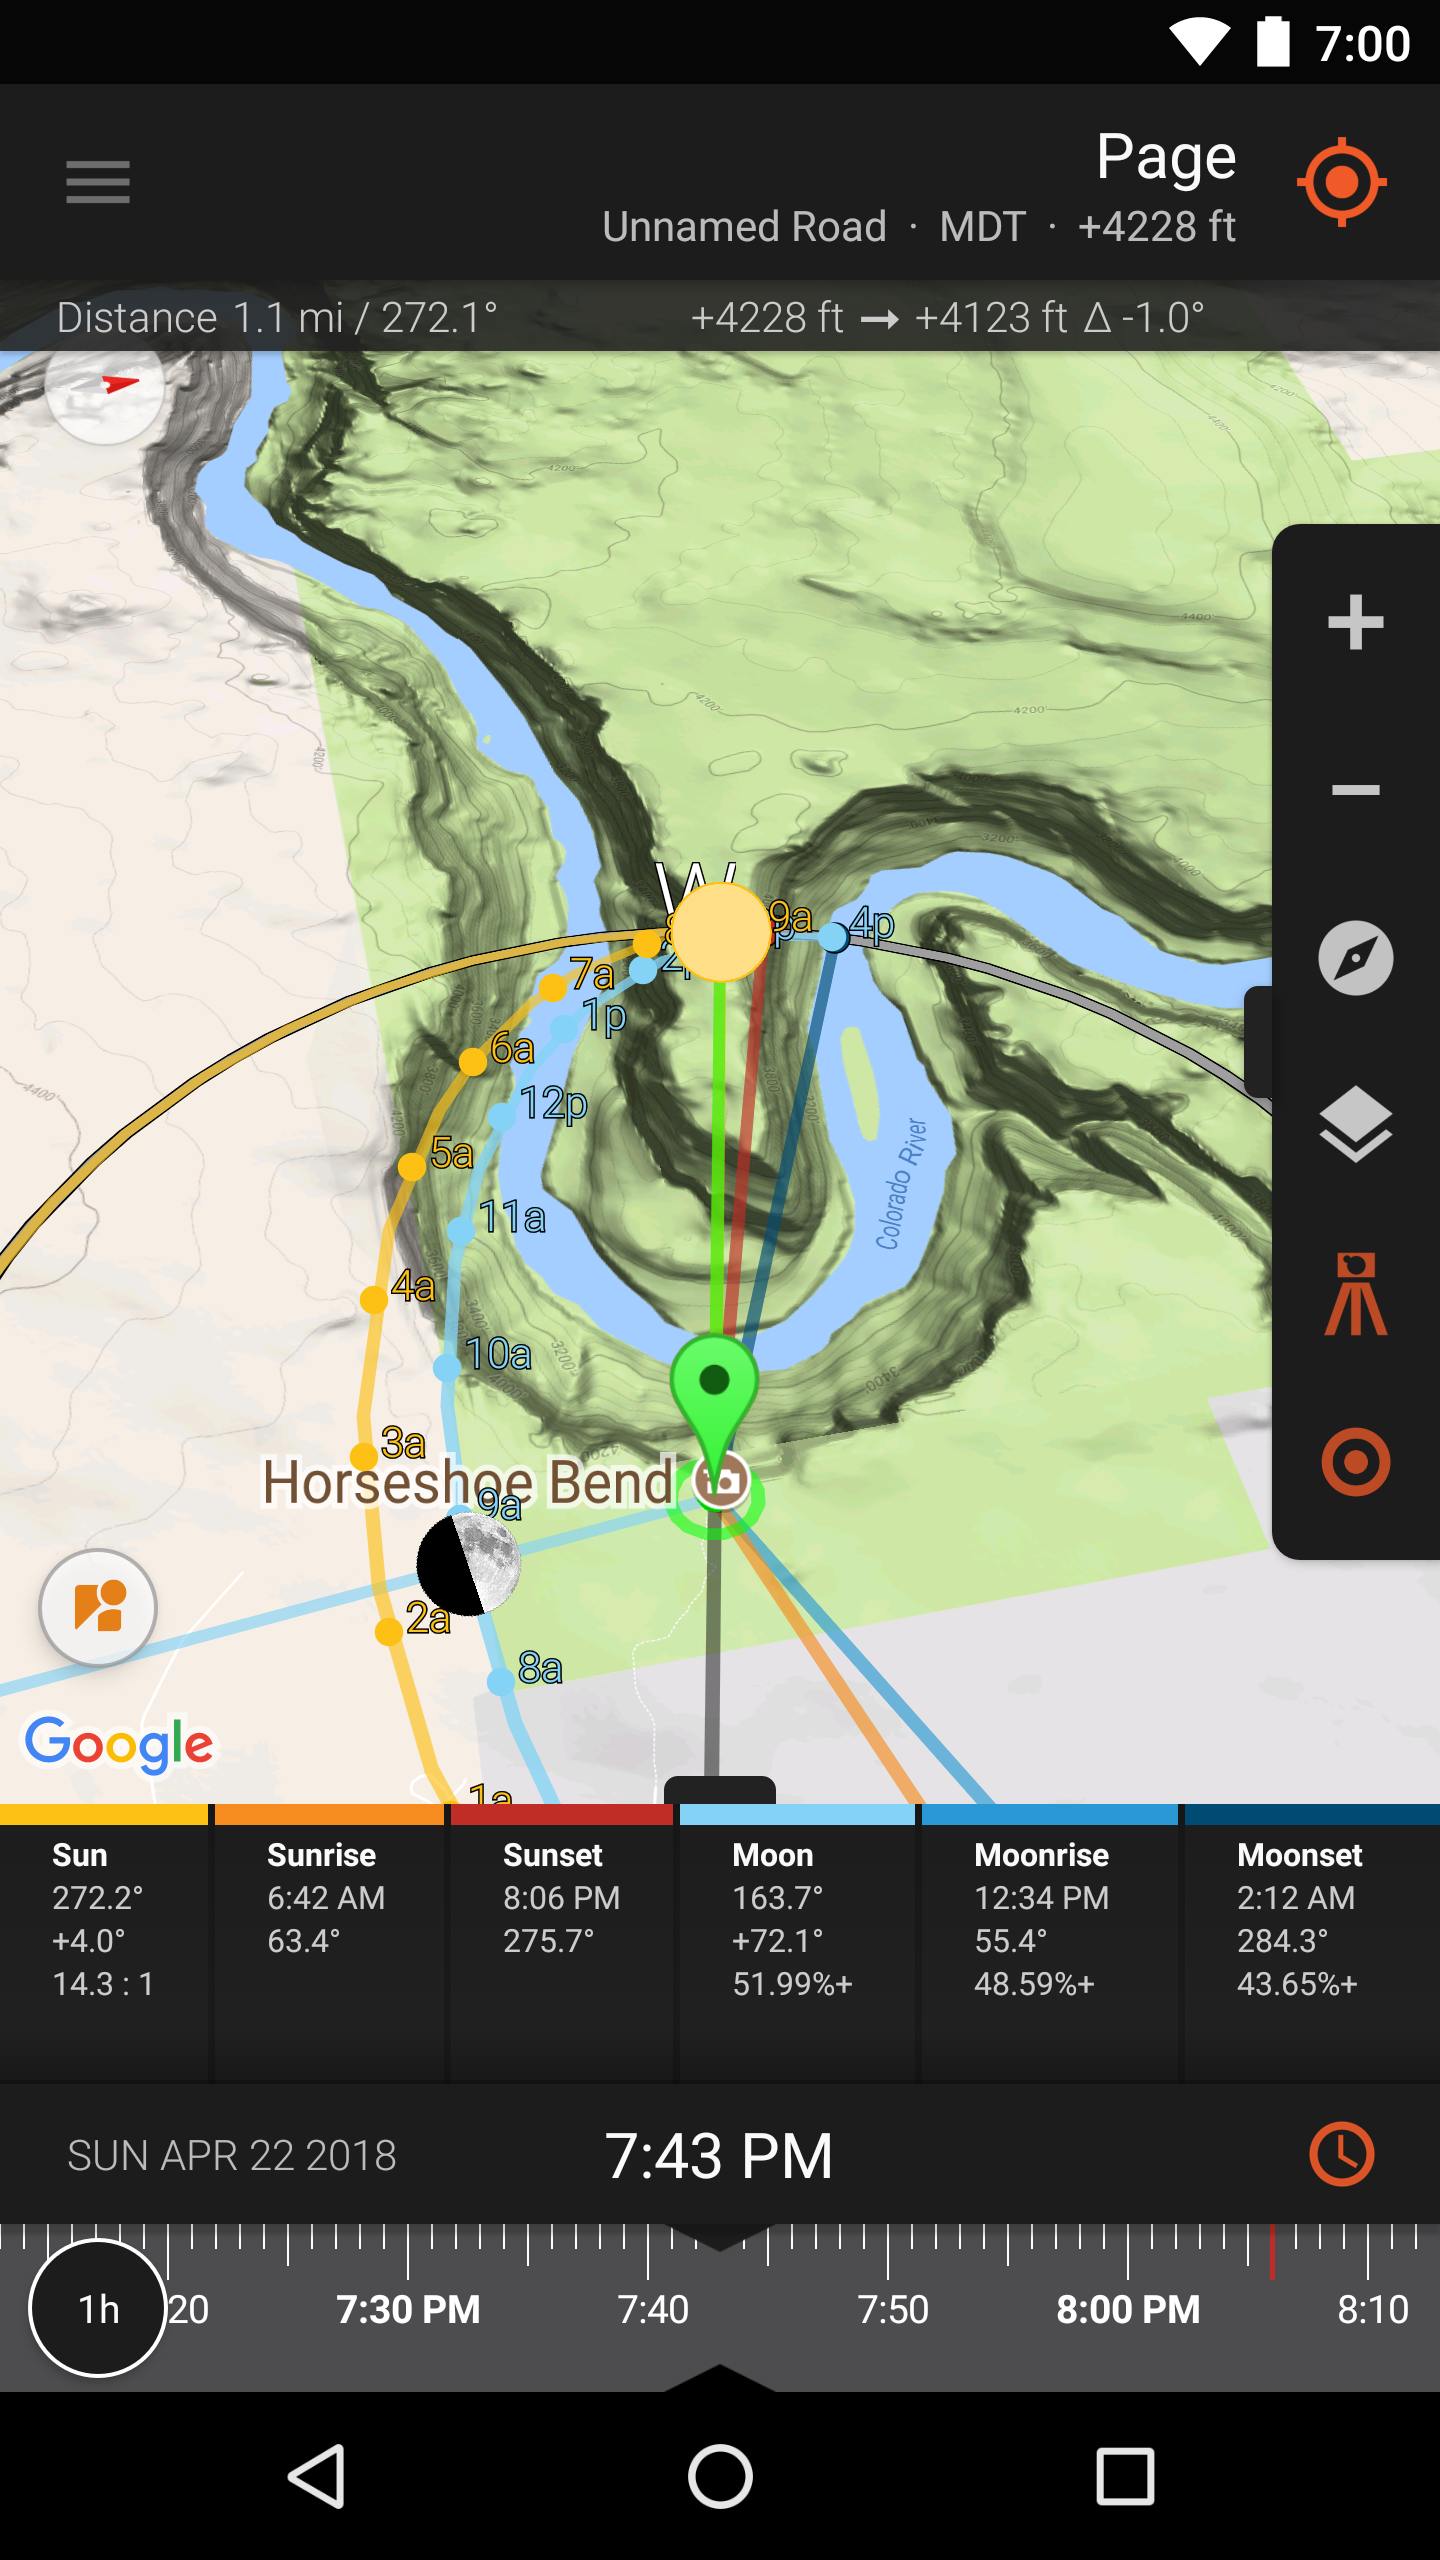 Sun surveyor sun moon position visualization and tracking app screenshot map view terrain gumiabroncs Images